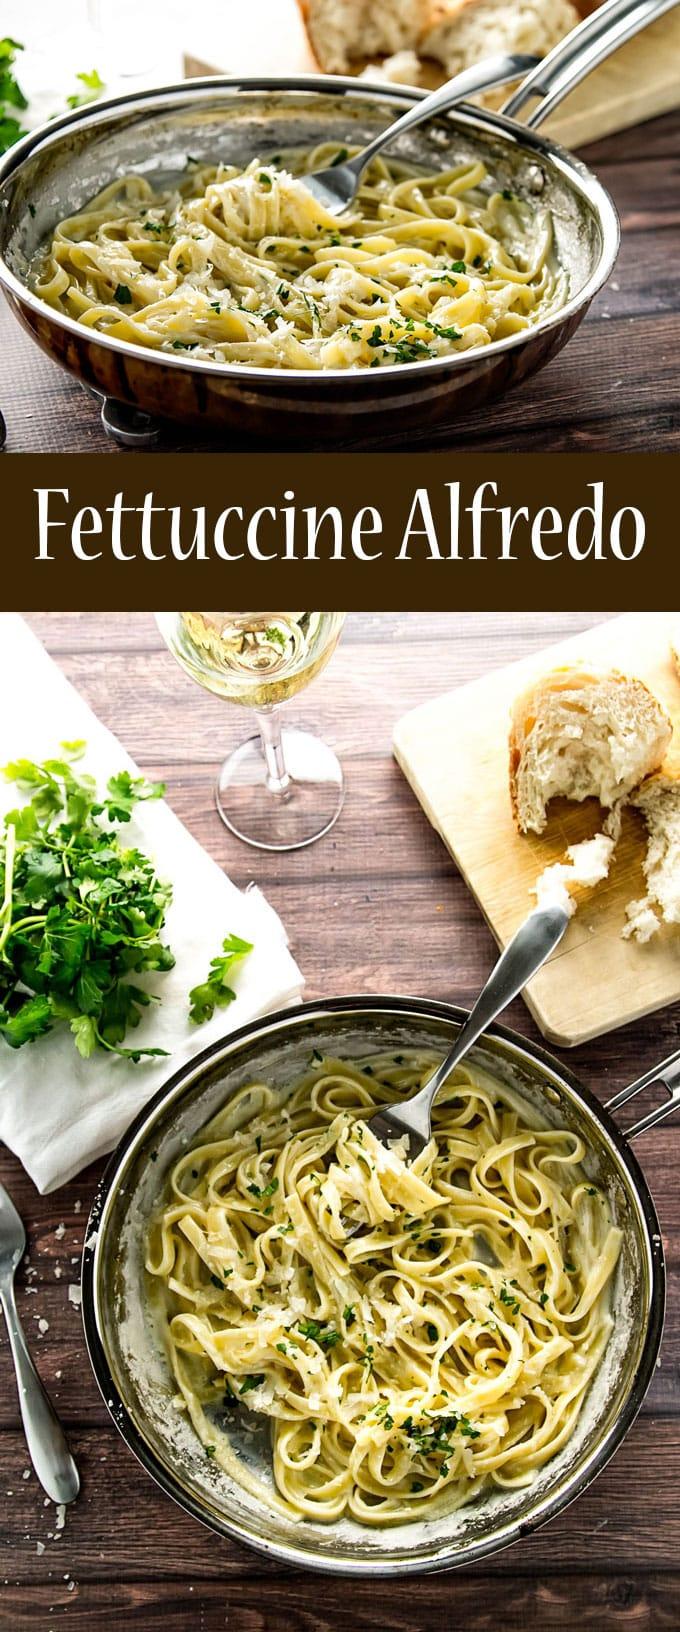 15-Minute Fettuccine Alfredo | girlgonegourmet.com